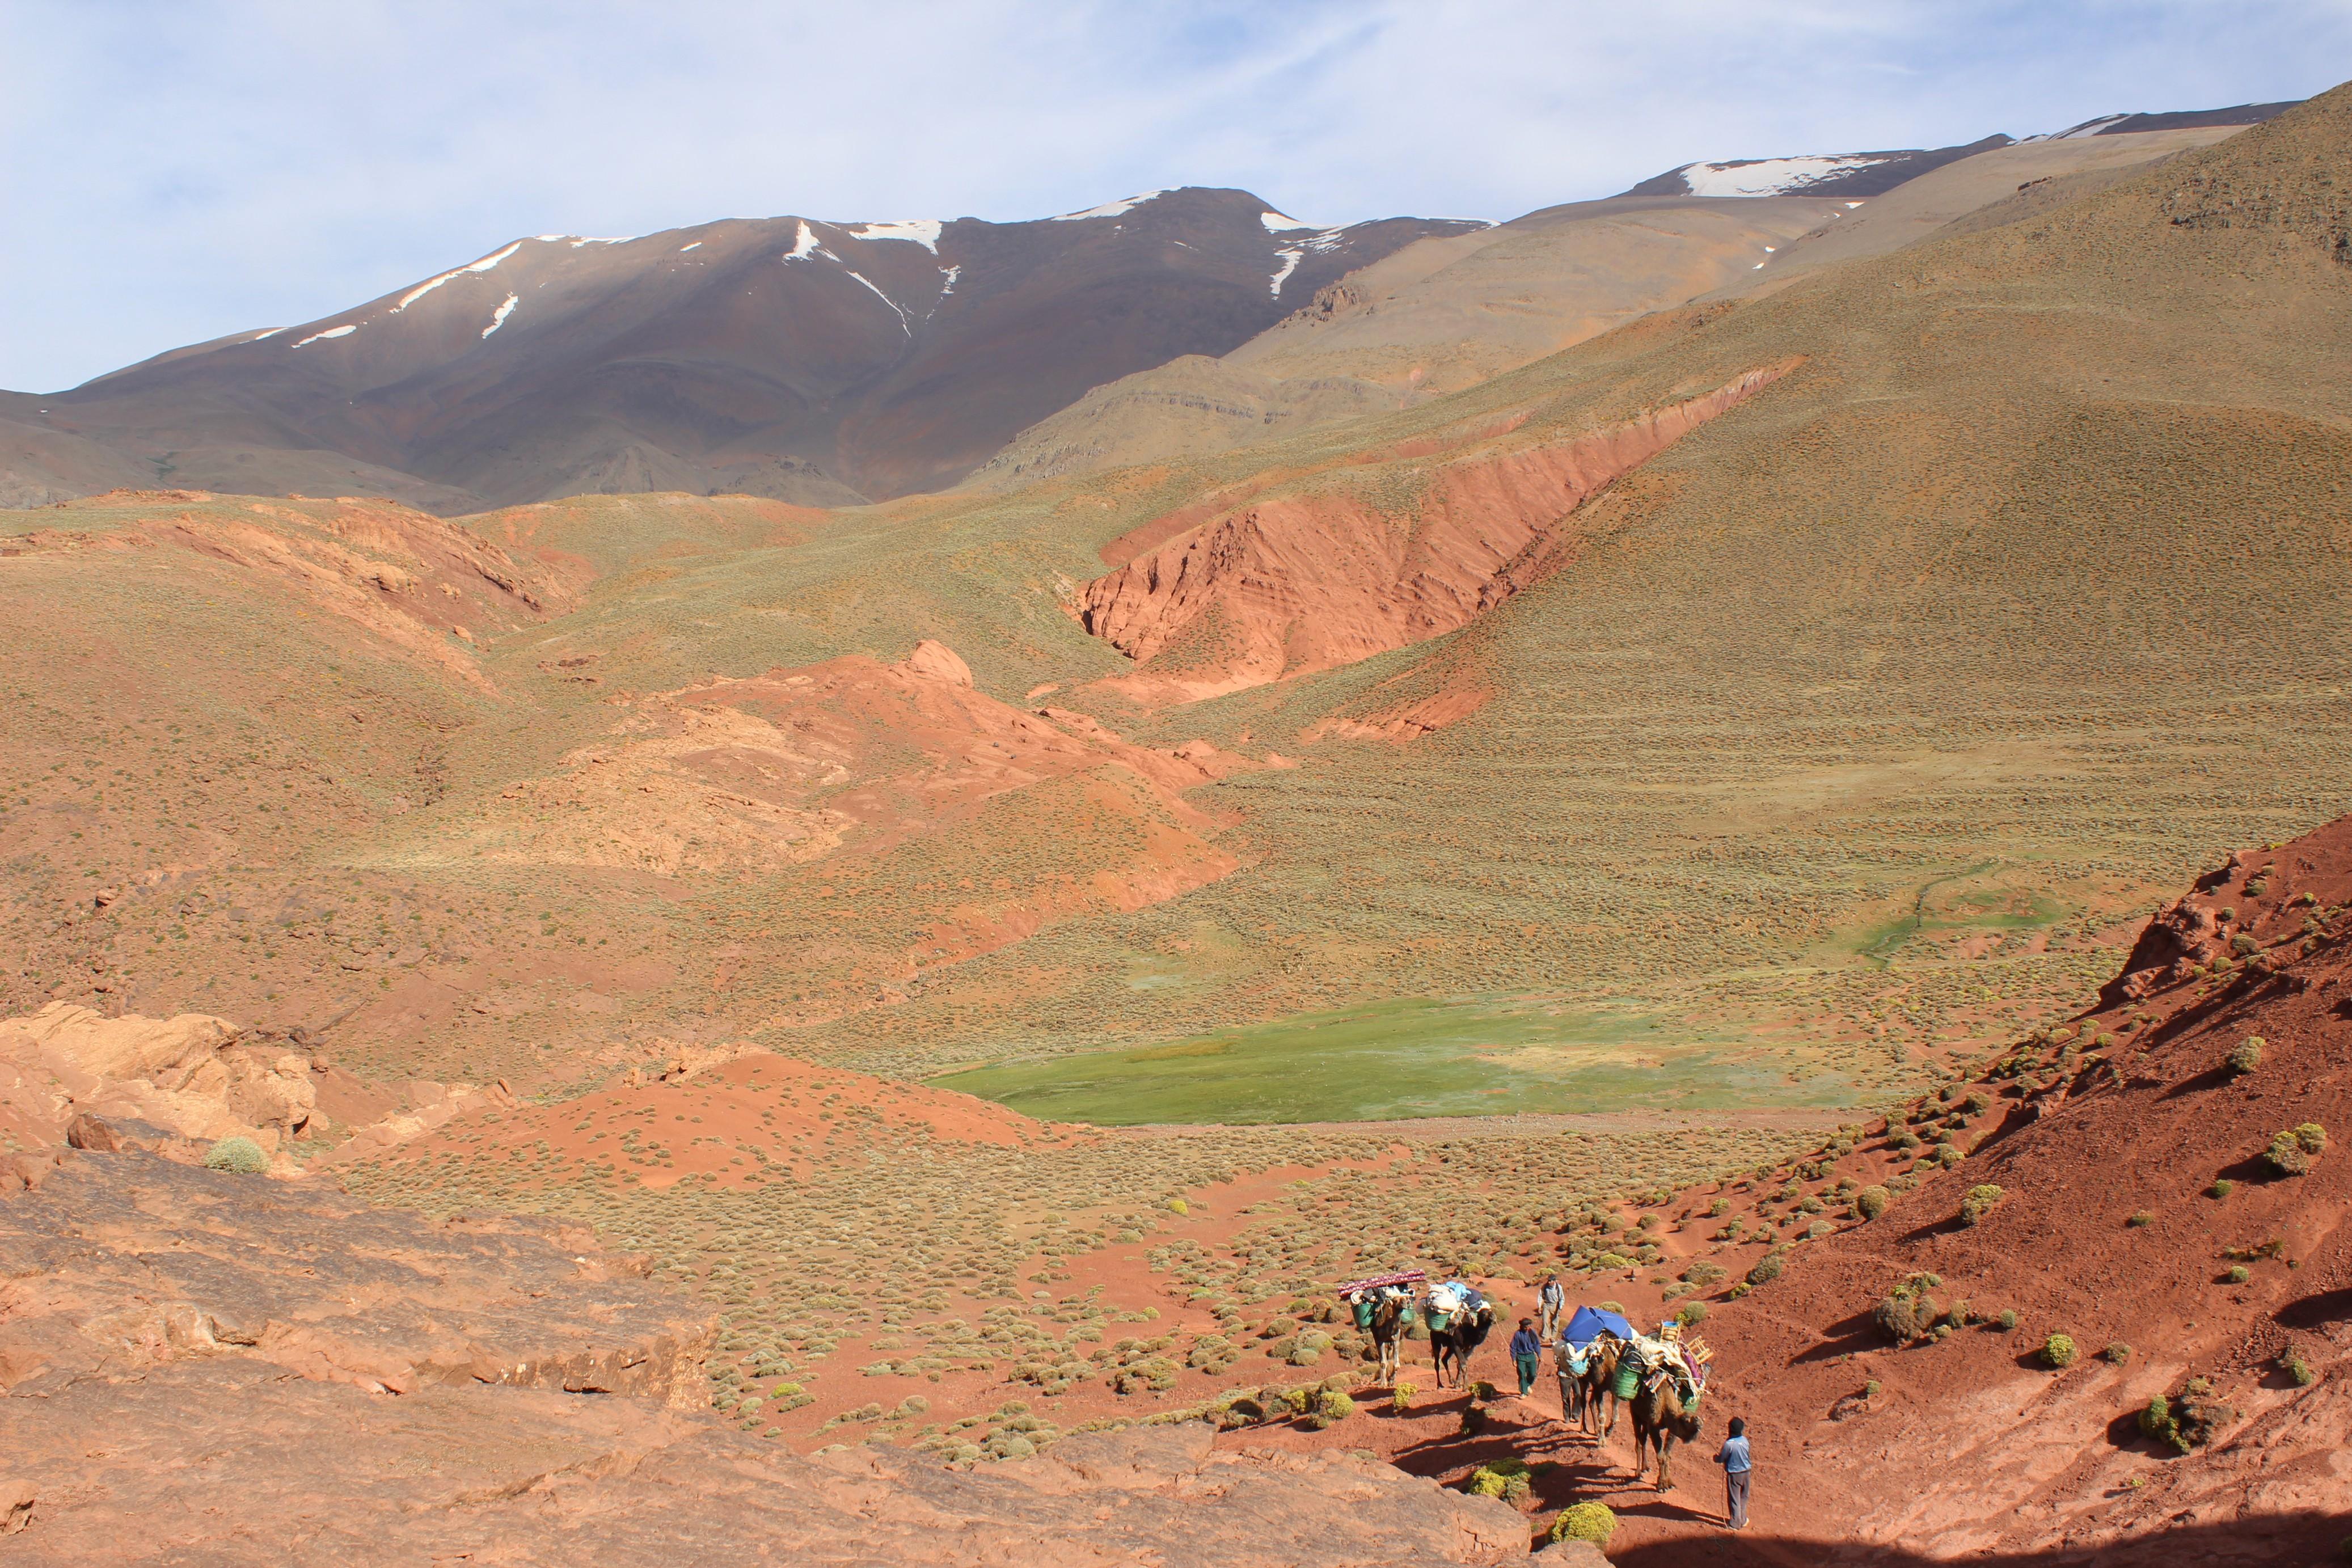 Camel train on lower slopes of Jebel M'goun